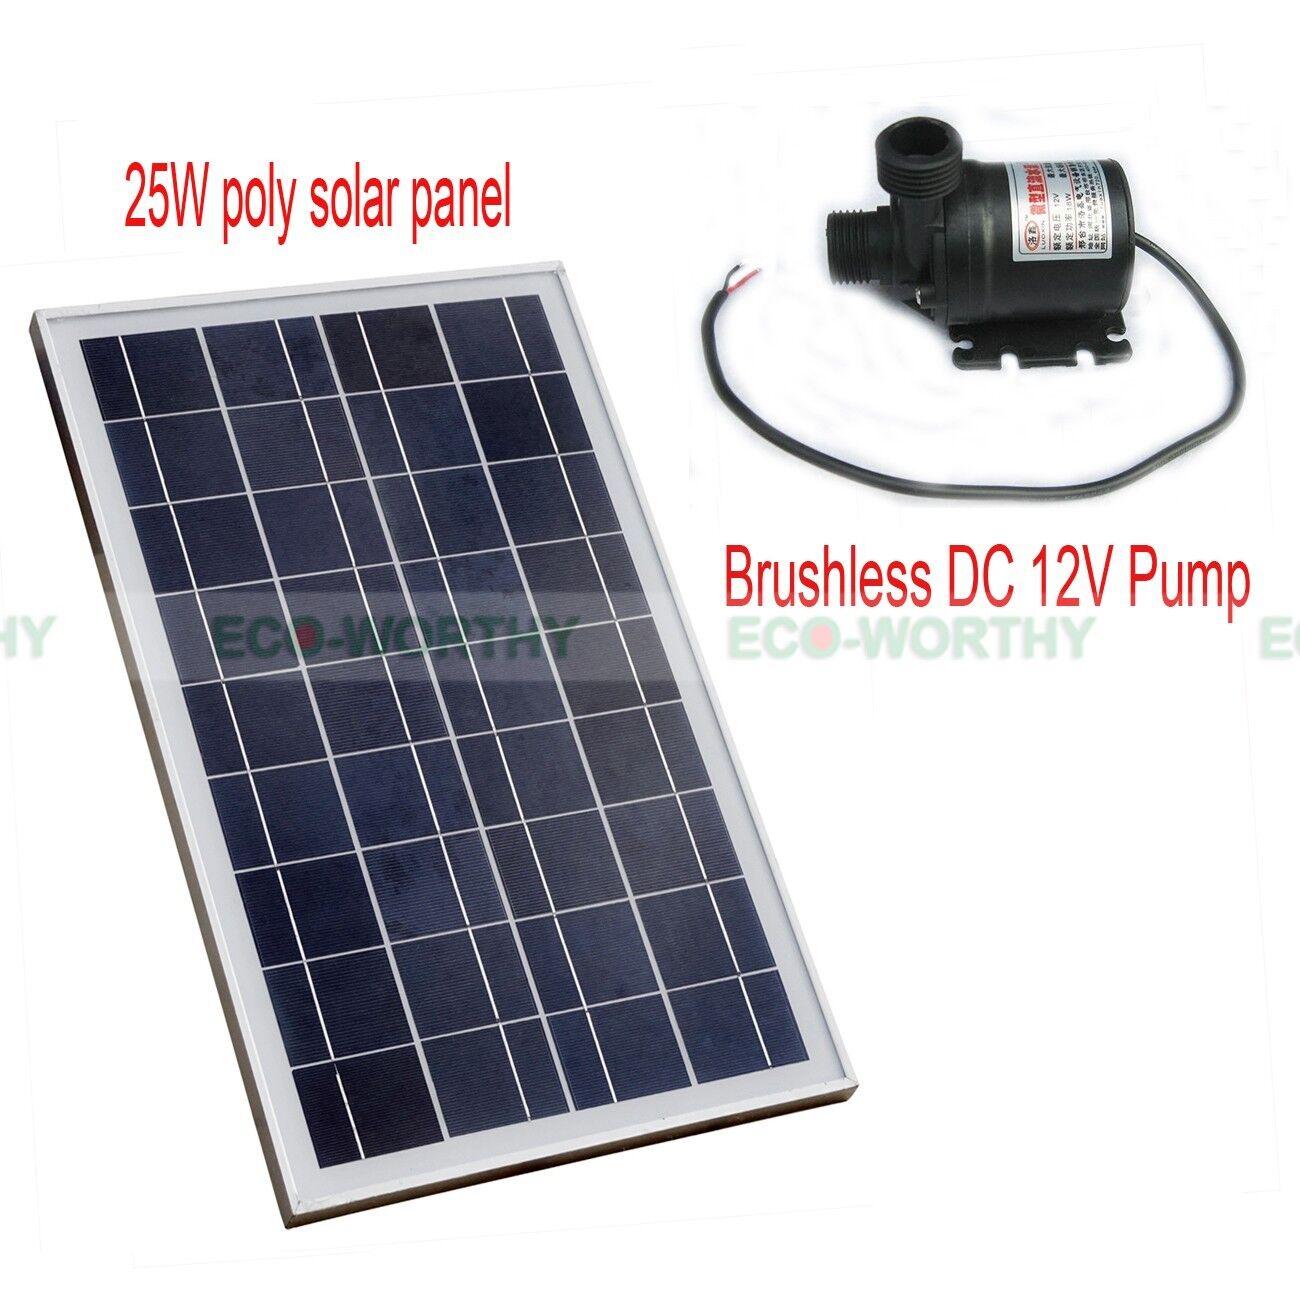 12V Solar Pump Kit 25W Solar & Hot Brushless Pump